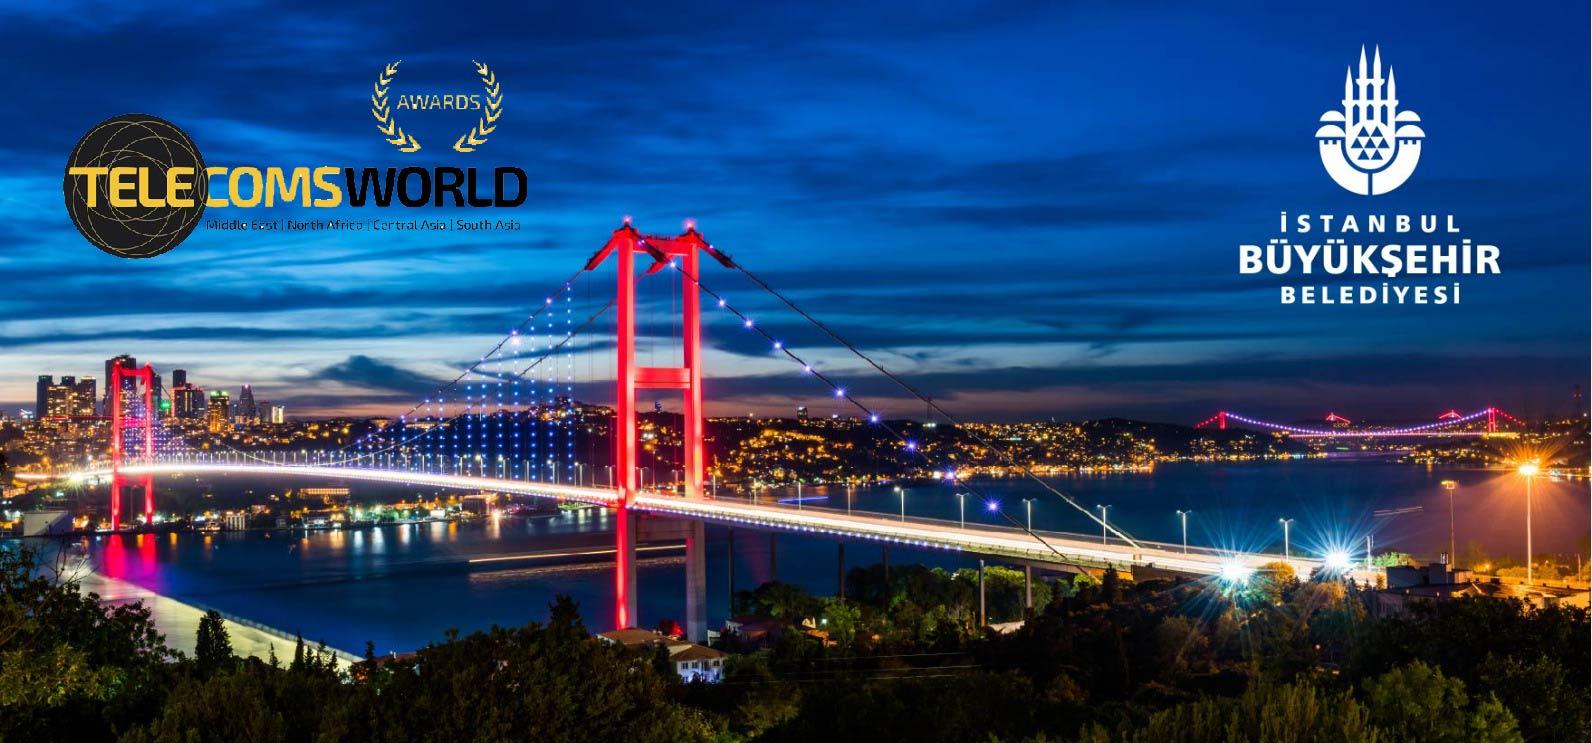 TELECOMS WORLD AWARDS'TAN İBB WİFİ HİZMETİNE ÖDÜL